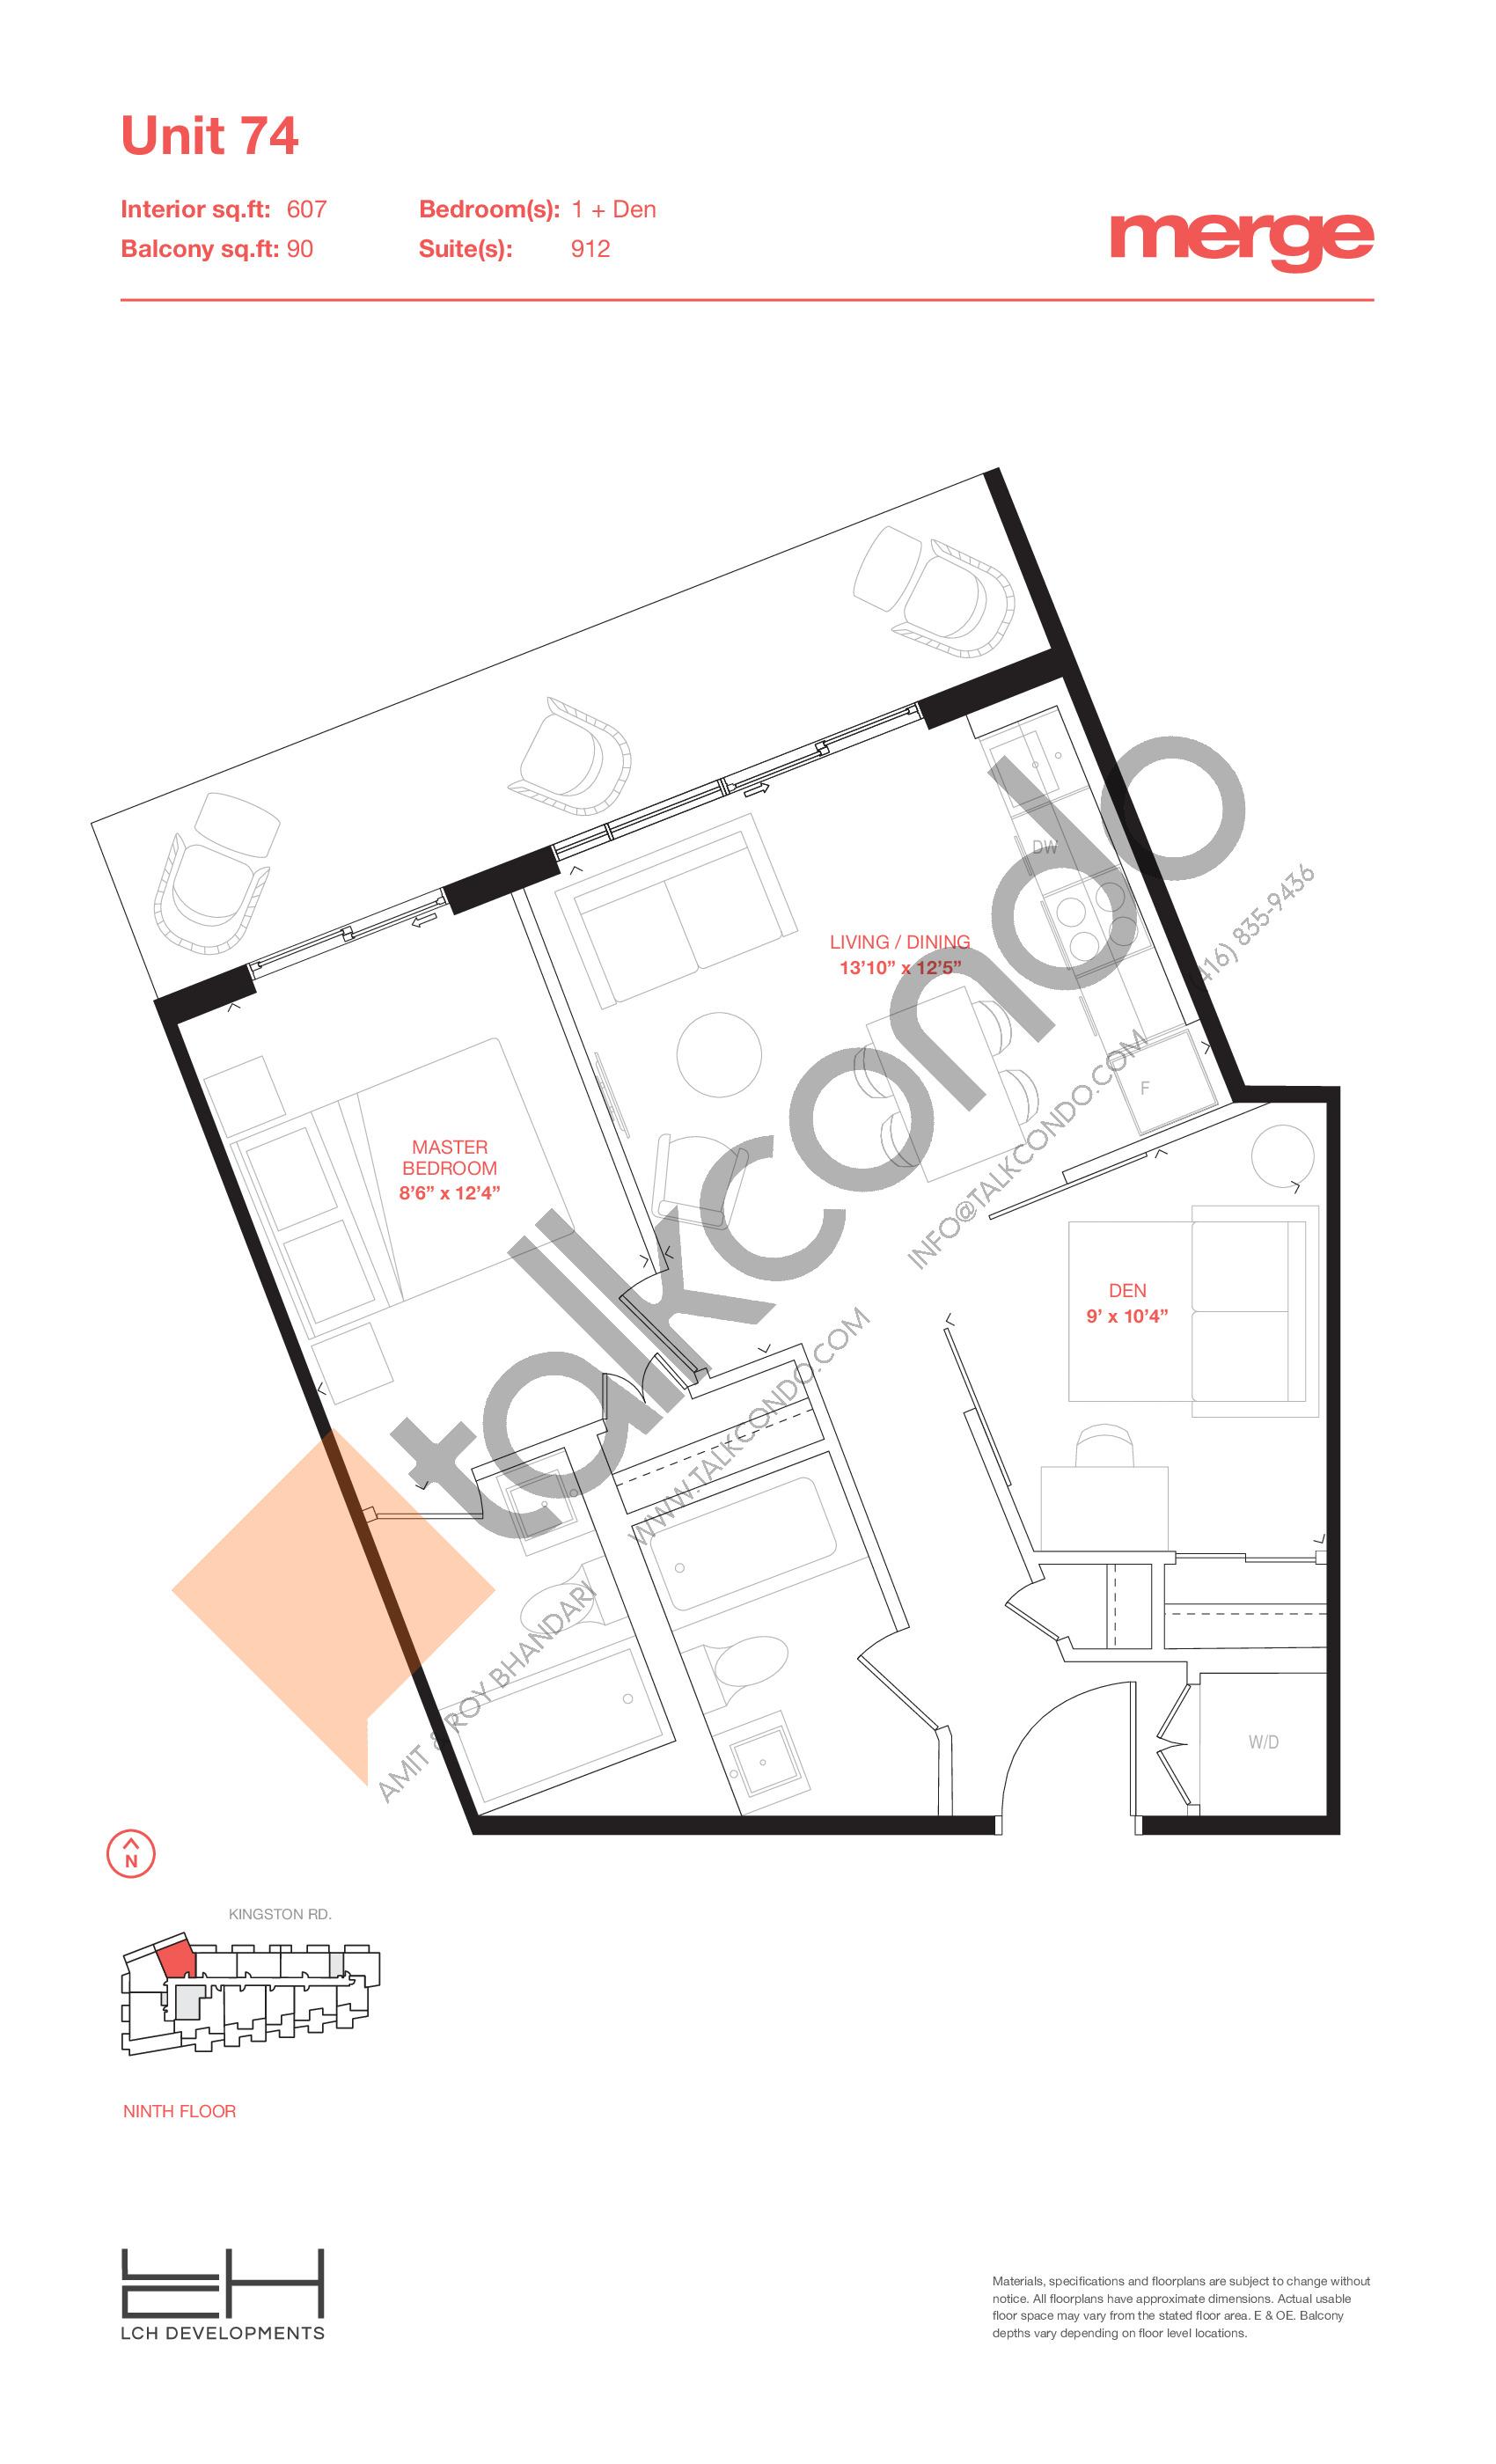 Unit 74 - Tower Floor Plan at Merge Condos - 607 sq.ft